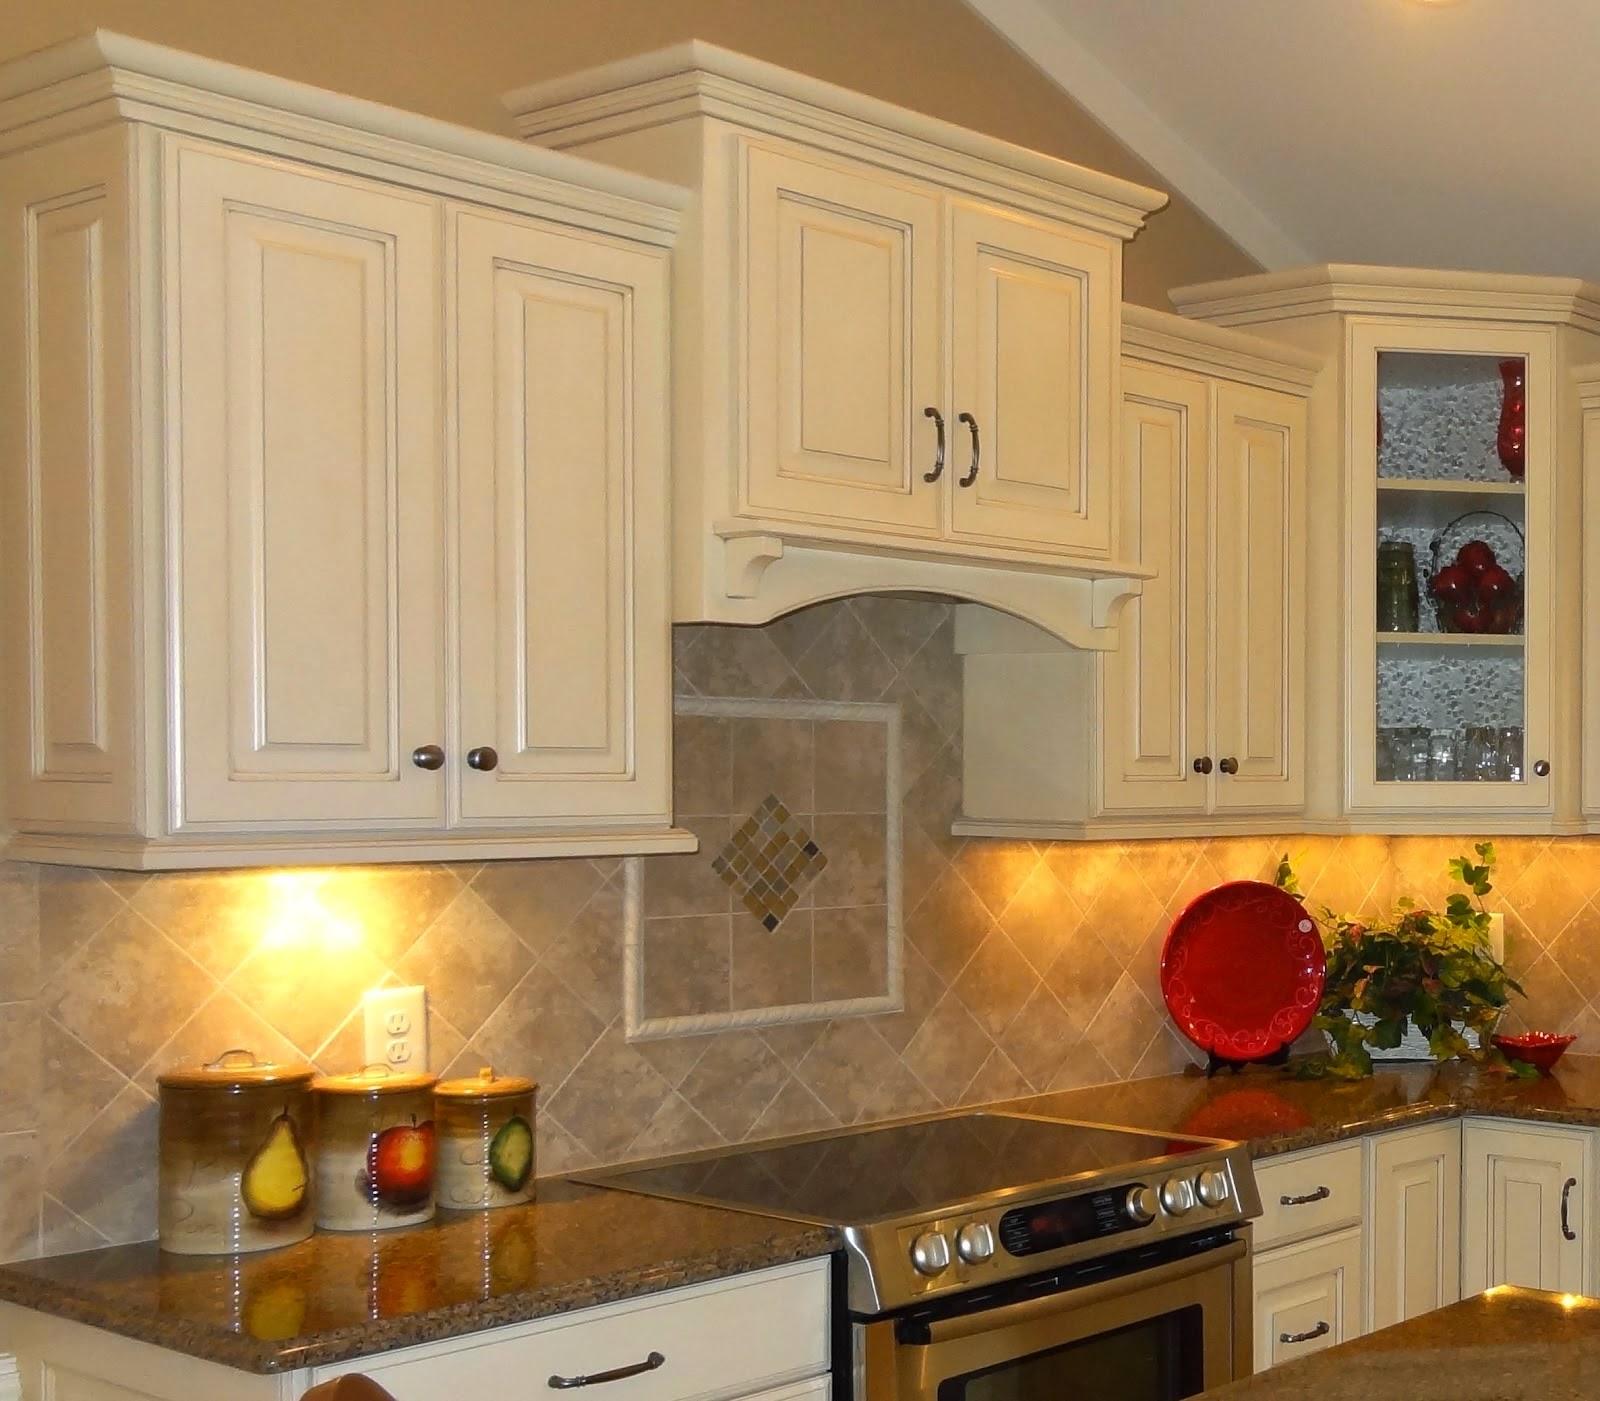 Interior decorating pics tile backsplash ideas dailygadgetfo Choice Image